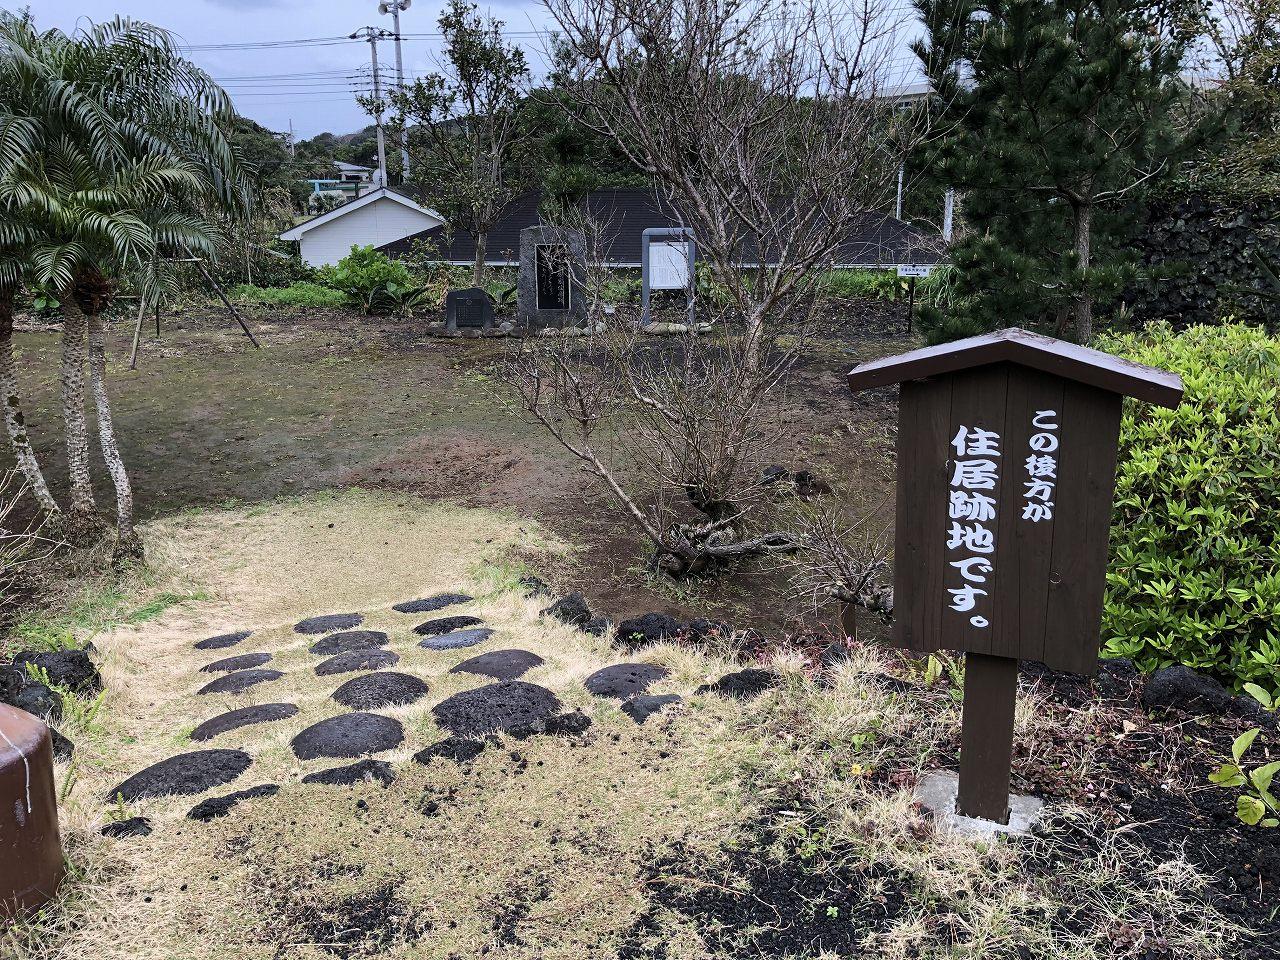 八丈島の宇喜多秀家の住居跡